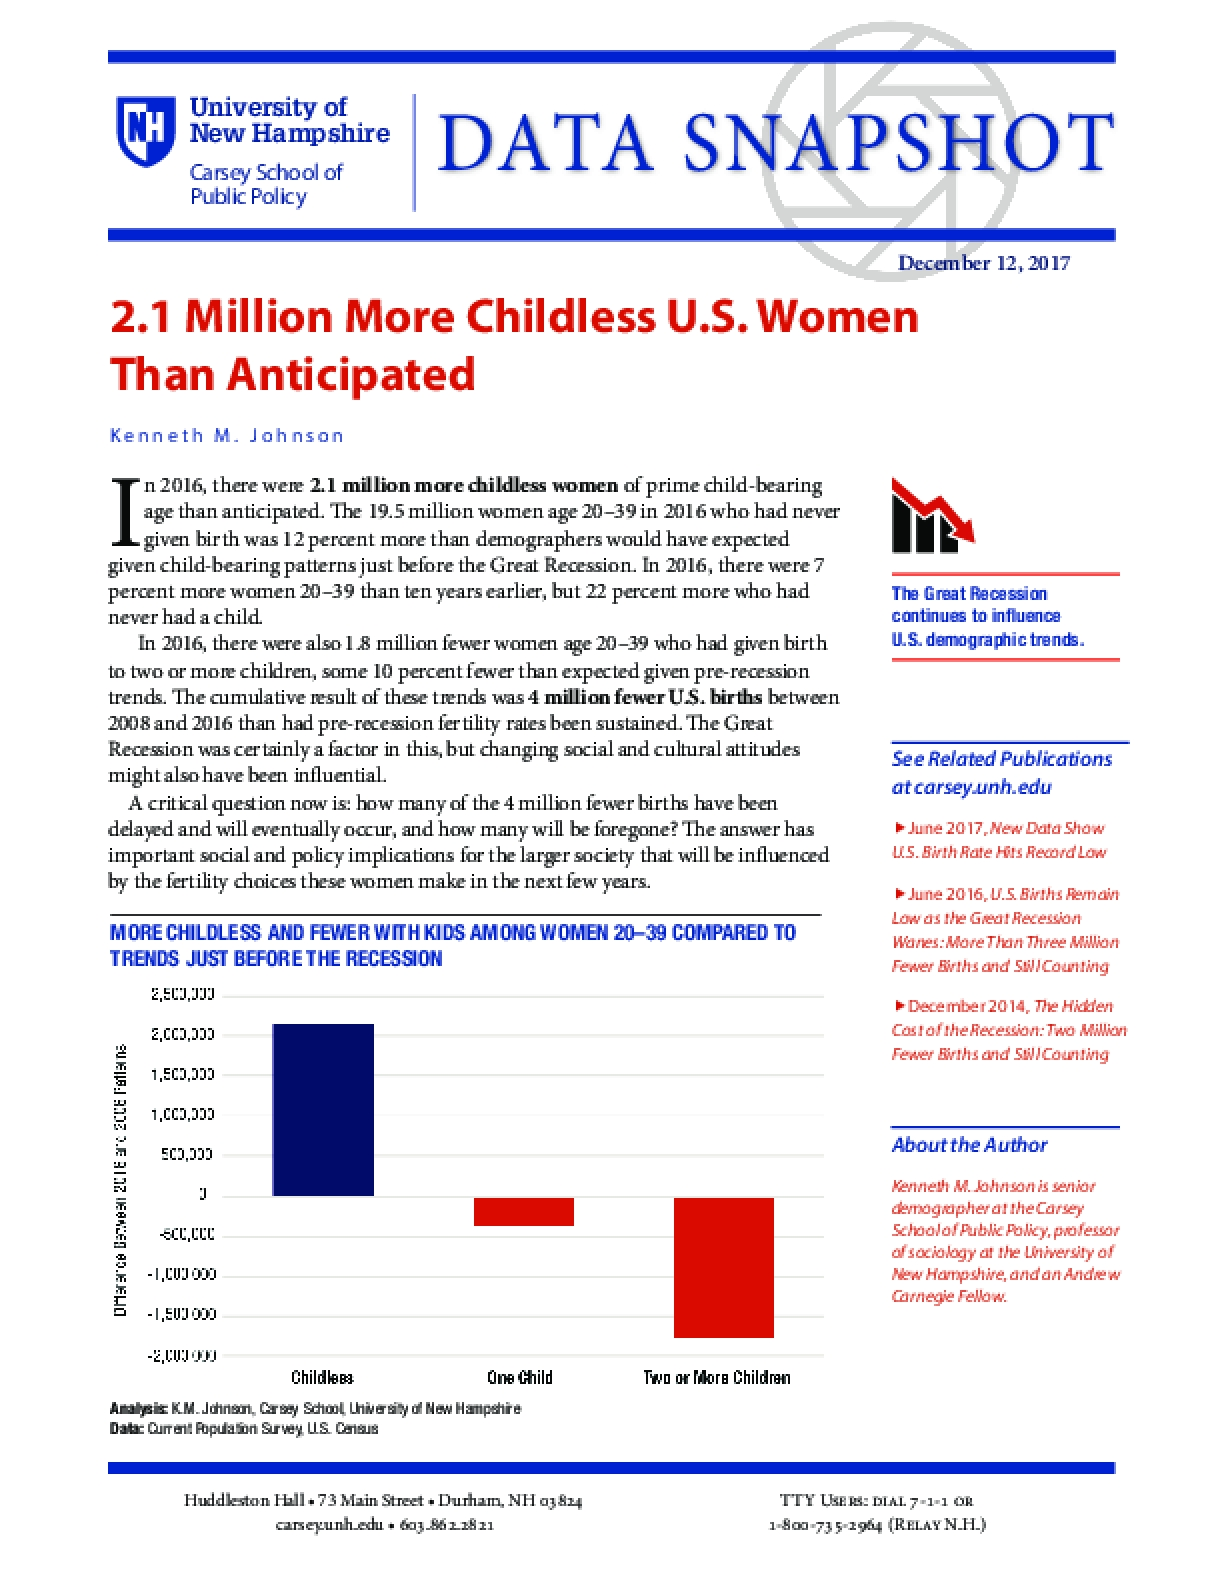 Data Snapshot: 2.1 Million More Childless U.S. Women Than Anticipated